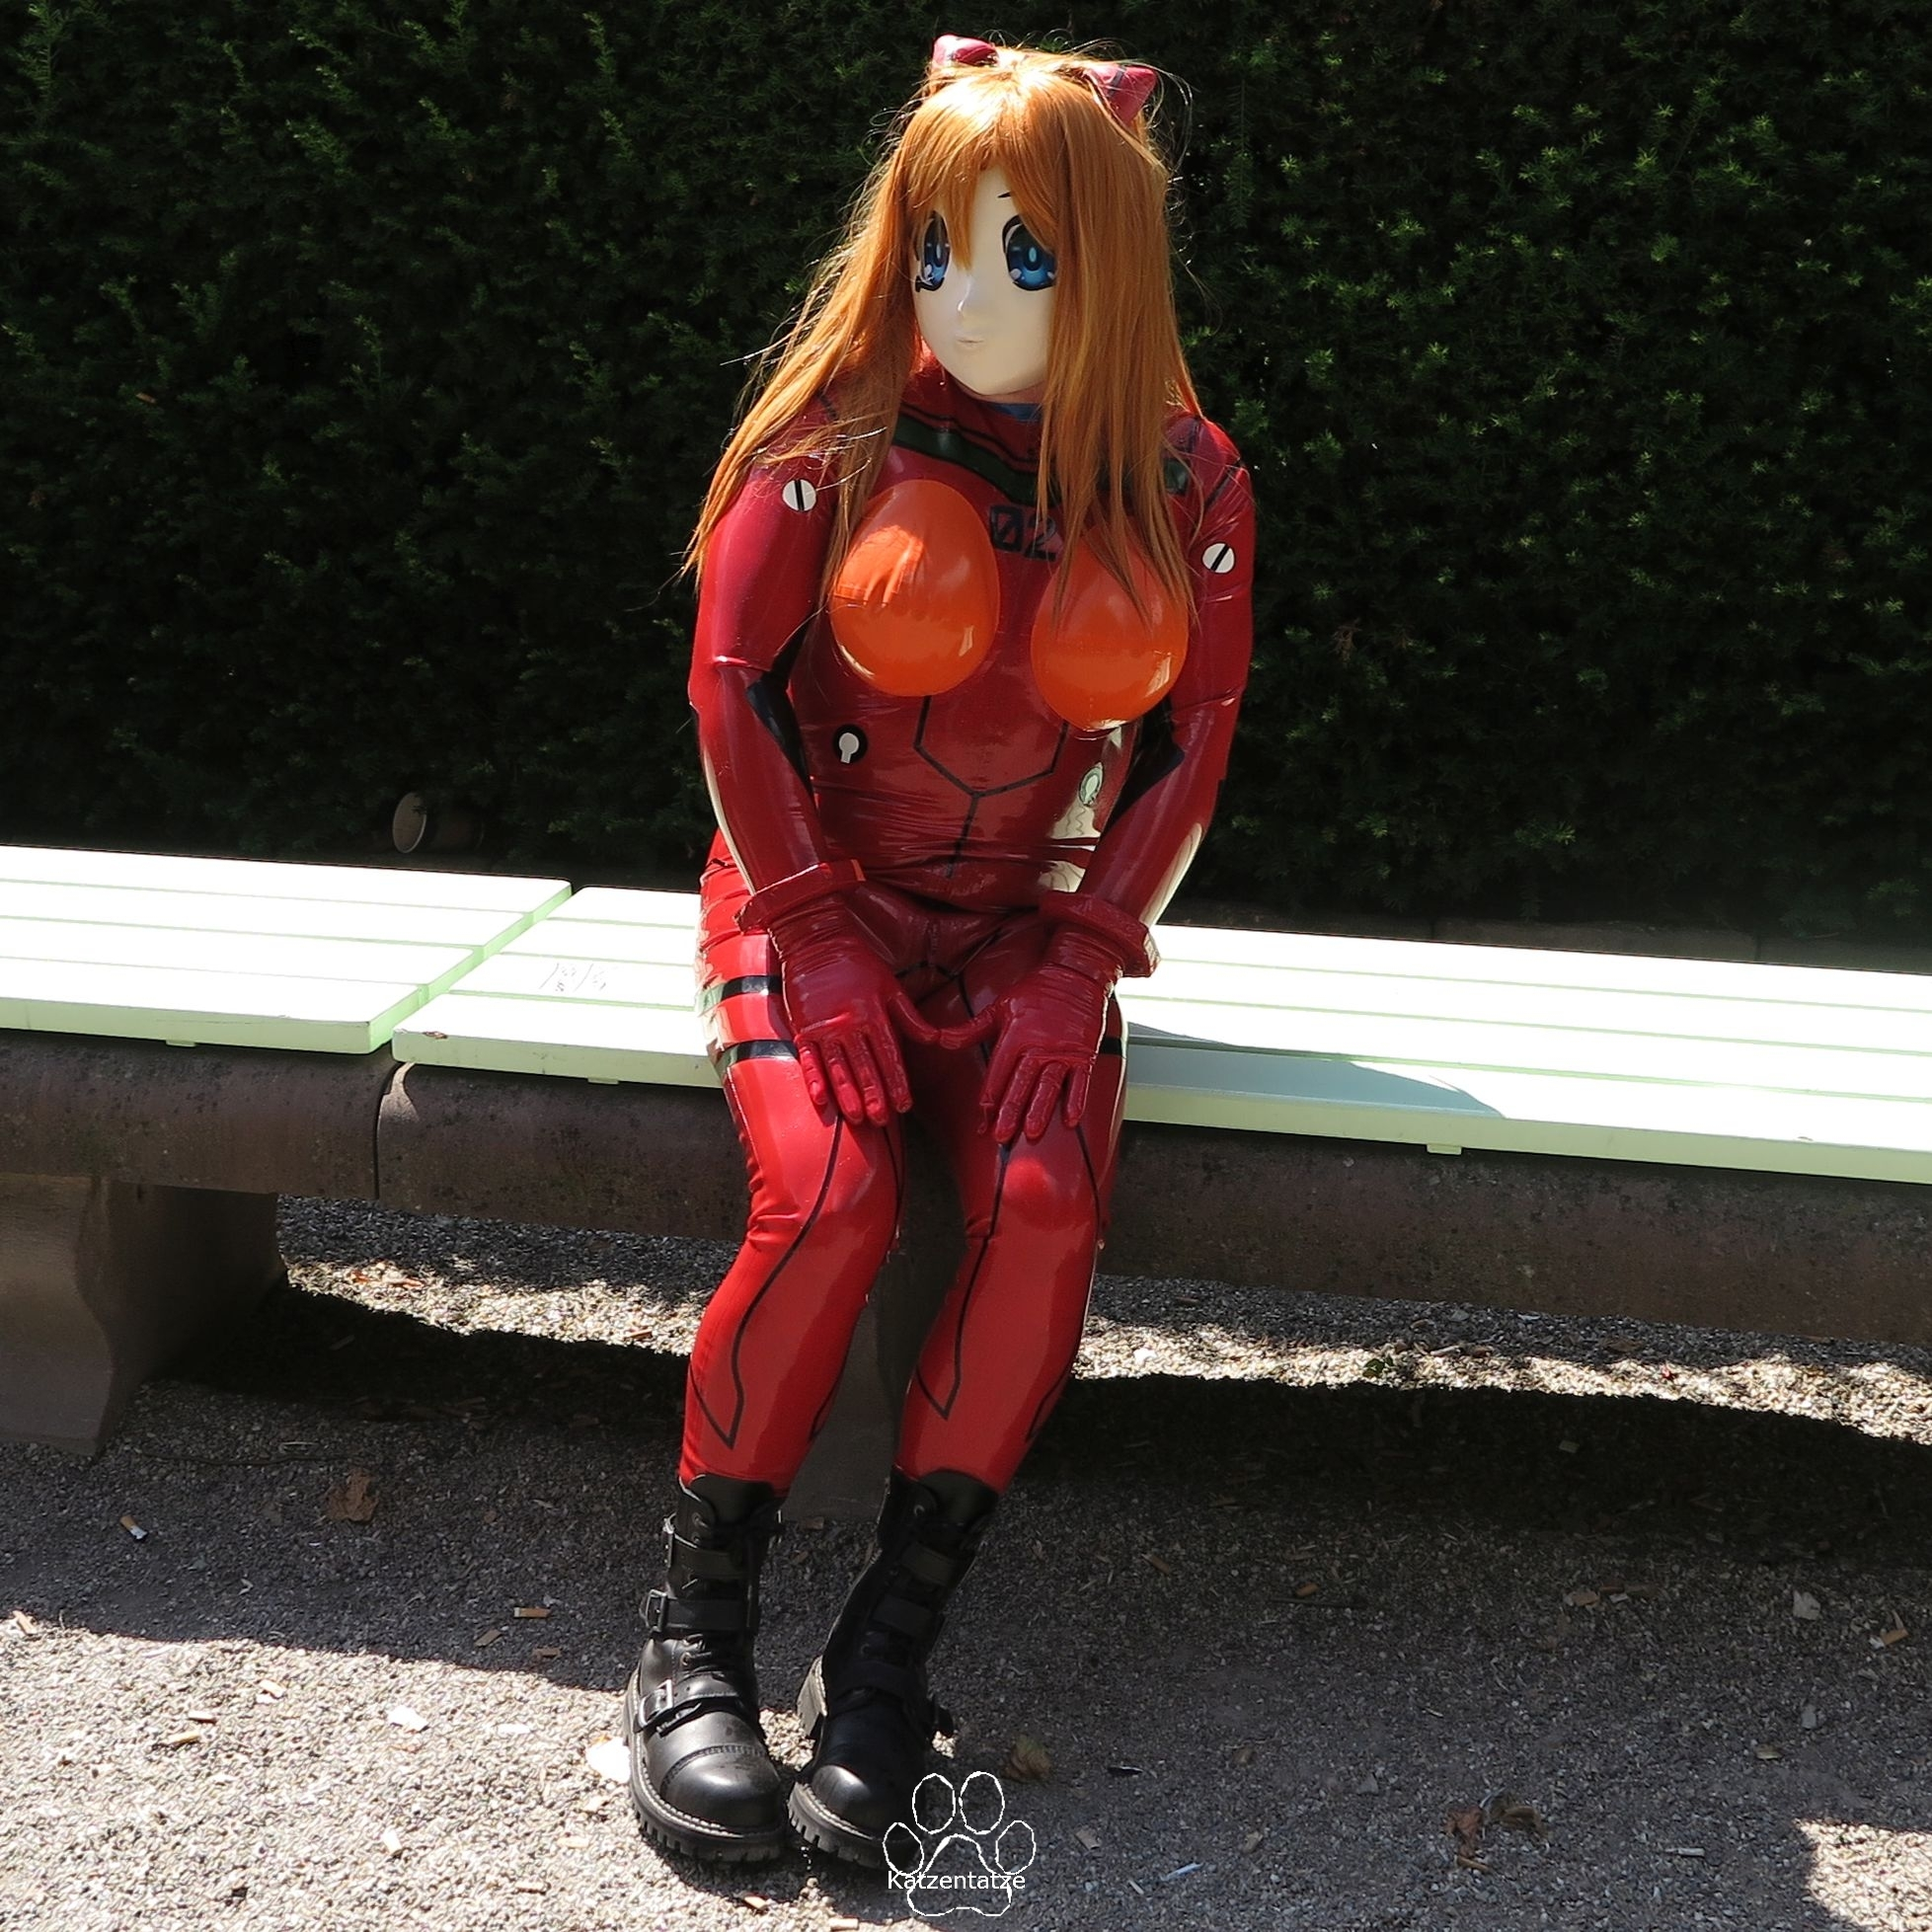 W5-Asuka muss sich auch mal ausruhen